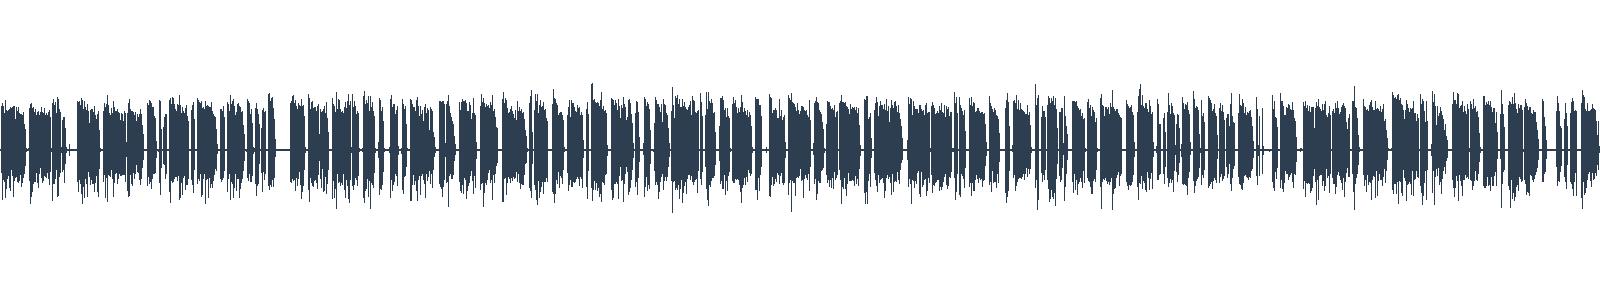 Adam Szustak: Hrniec strachu (1) waveform